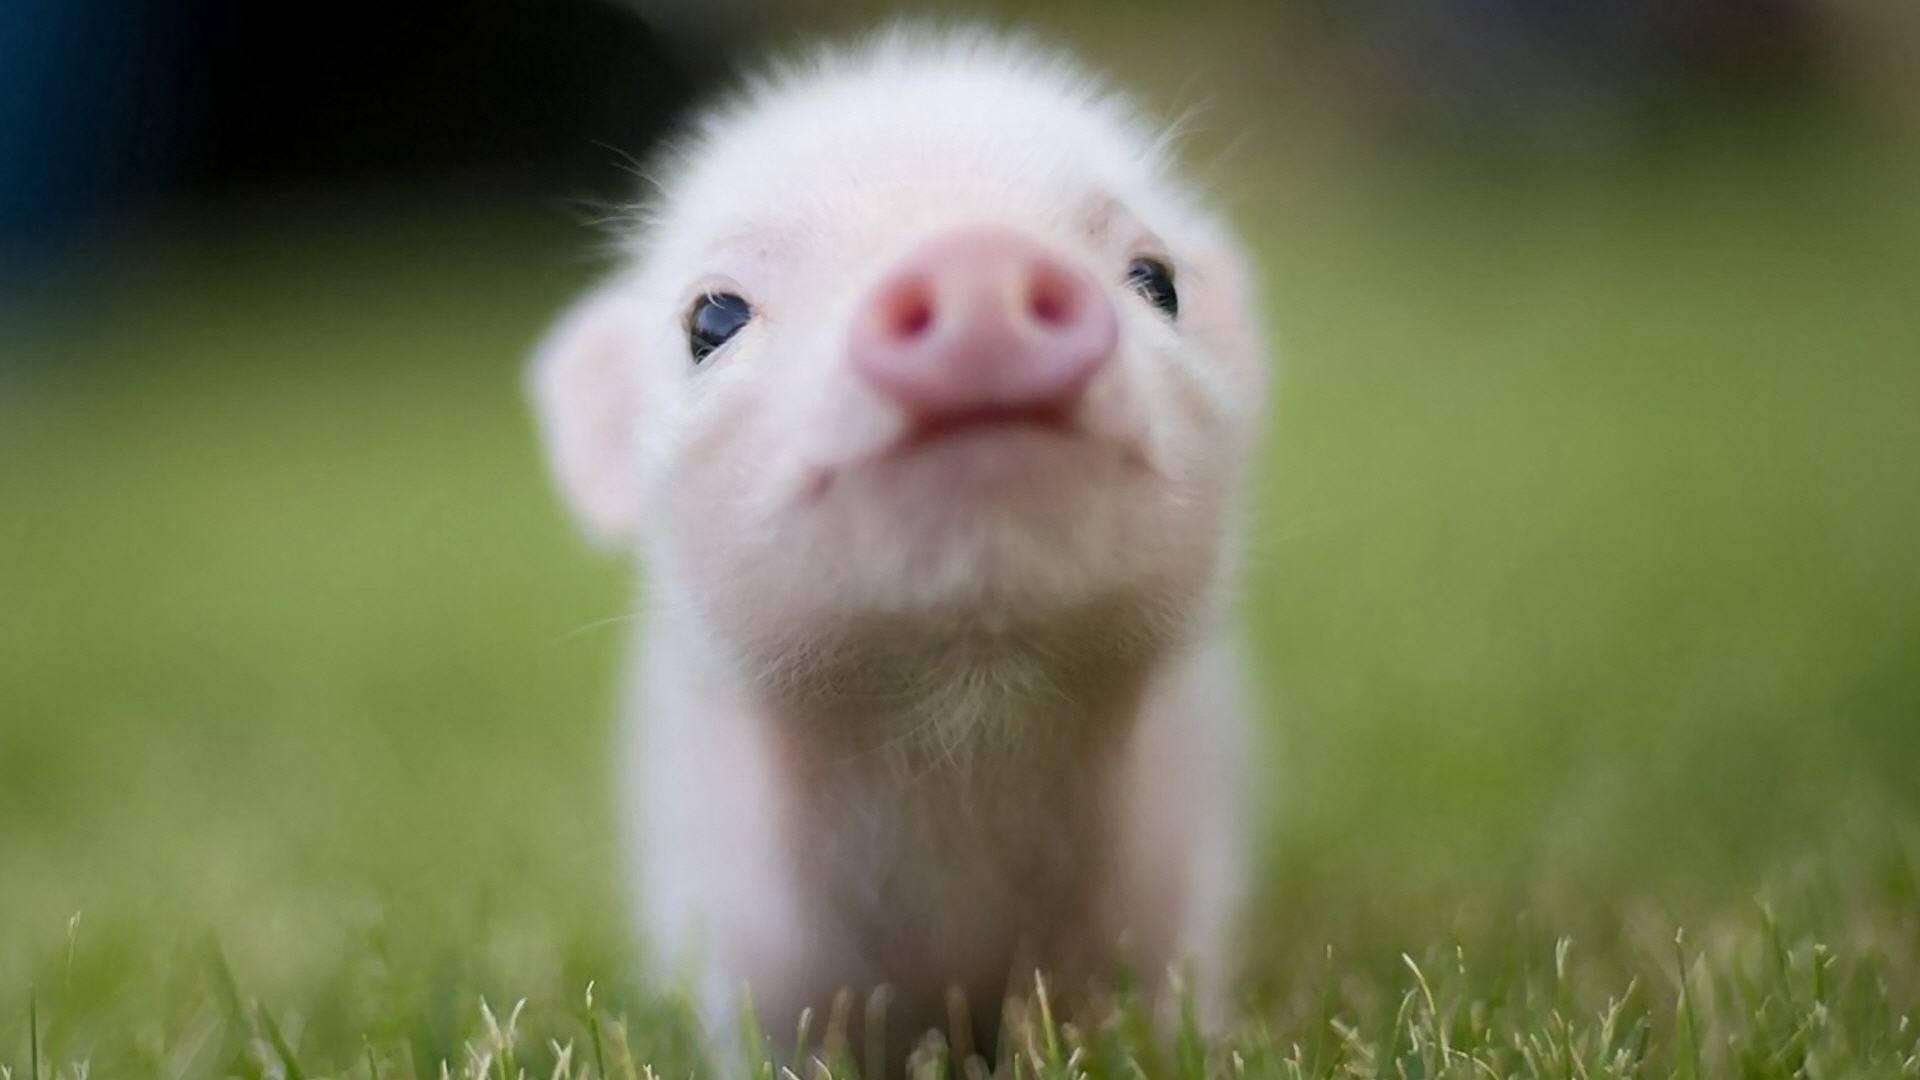 cute pig   Animal Lovers Wallpaper 1920x1080